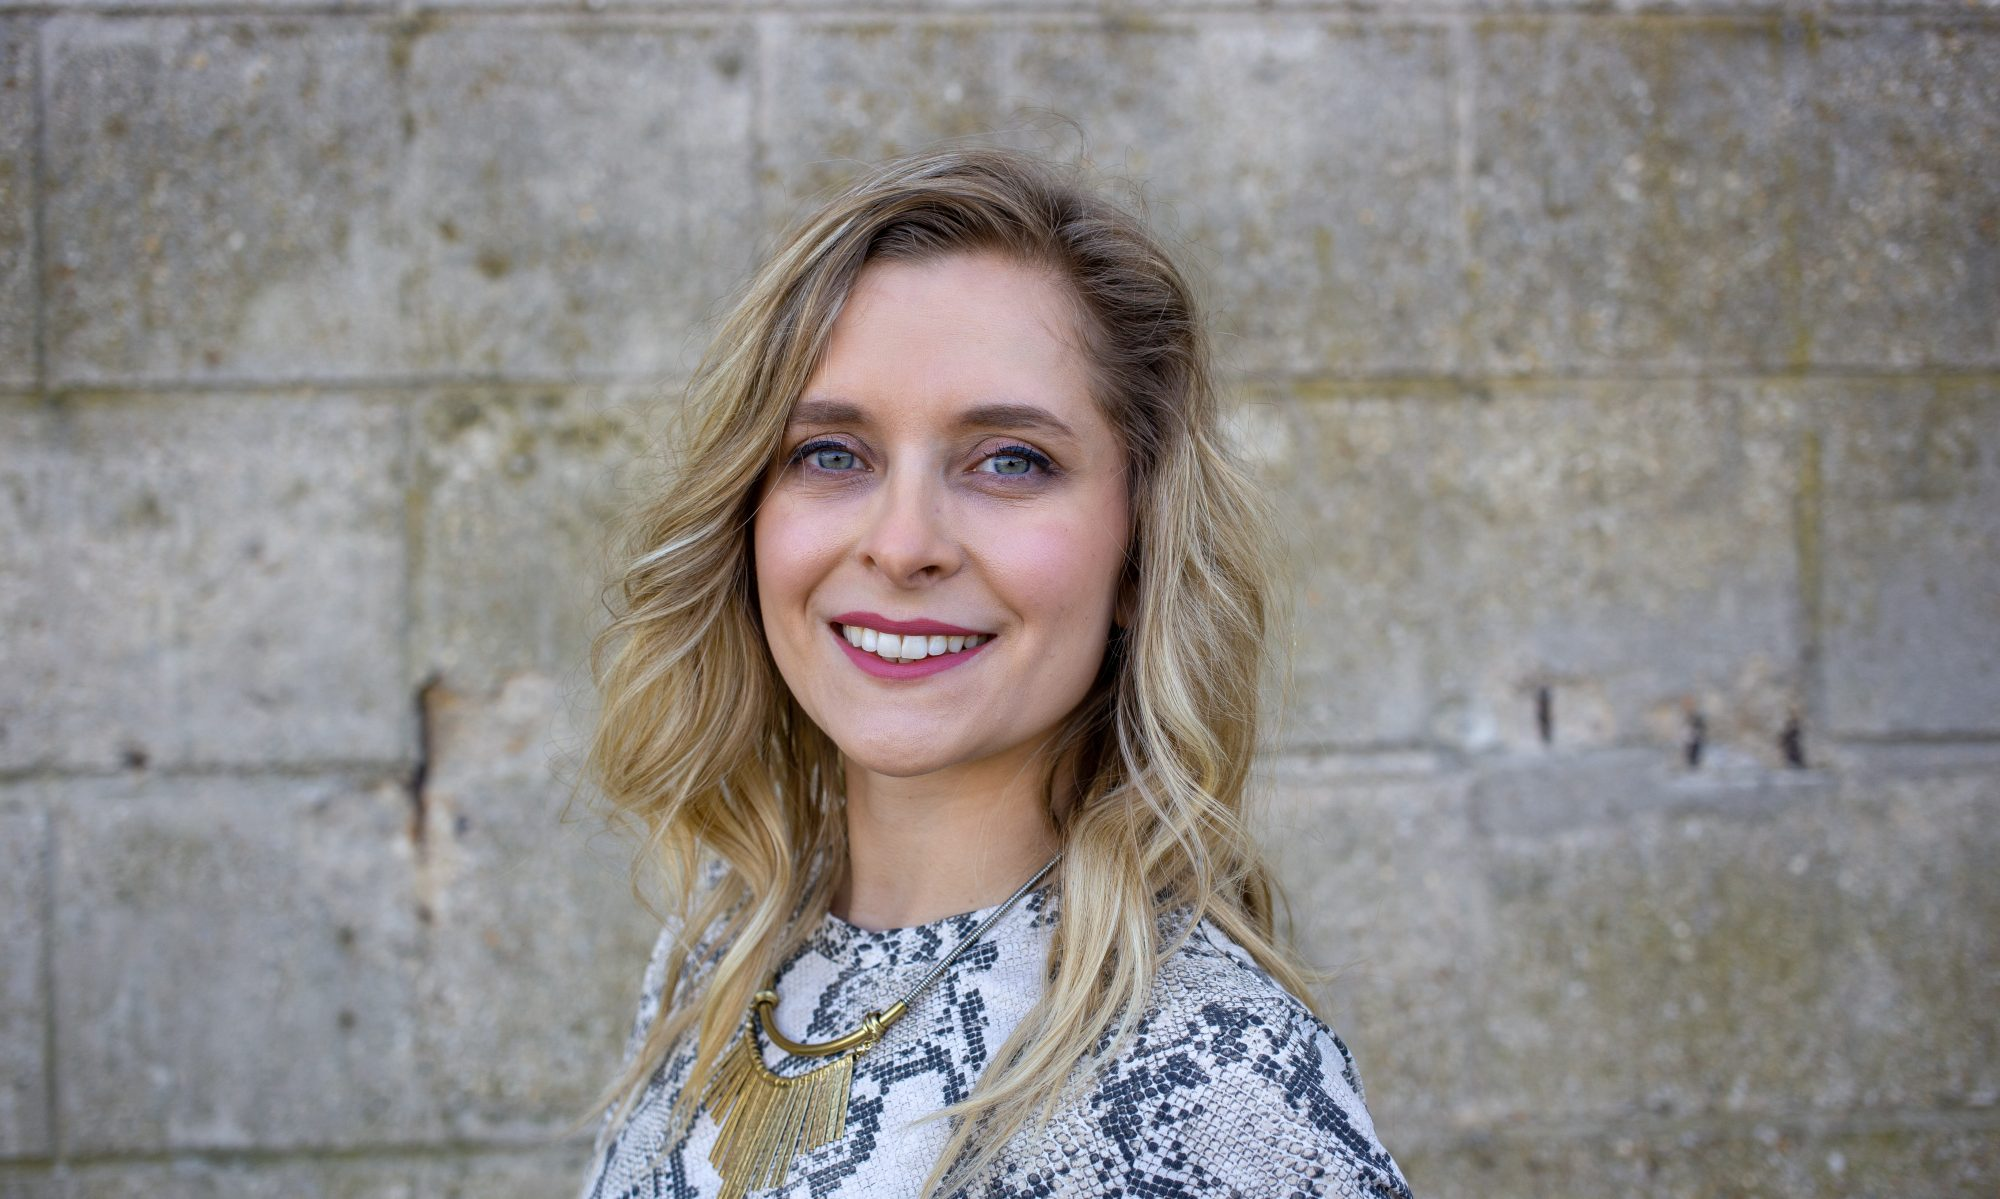 Elly Norris - Actress, Voice Actress